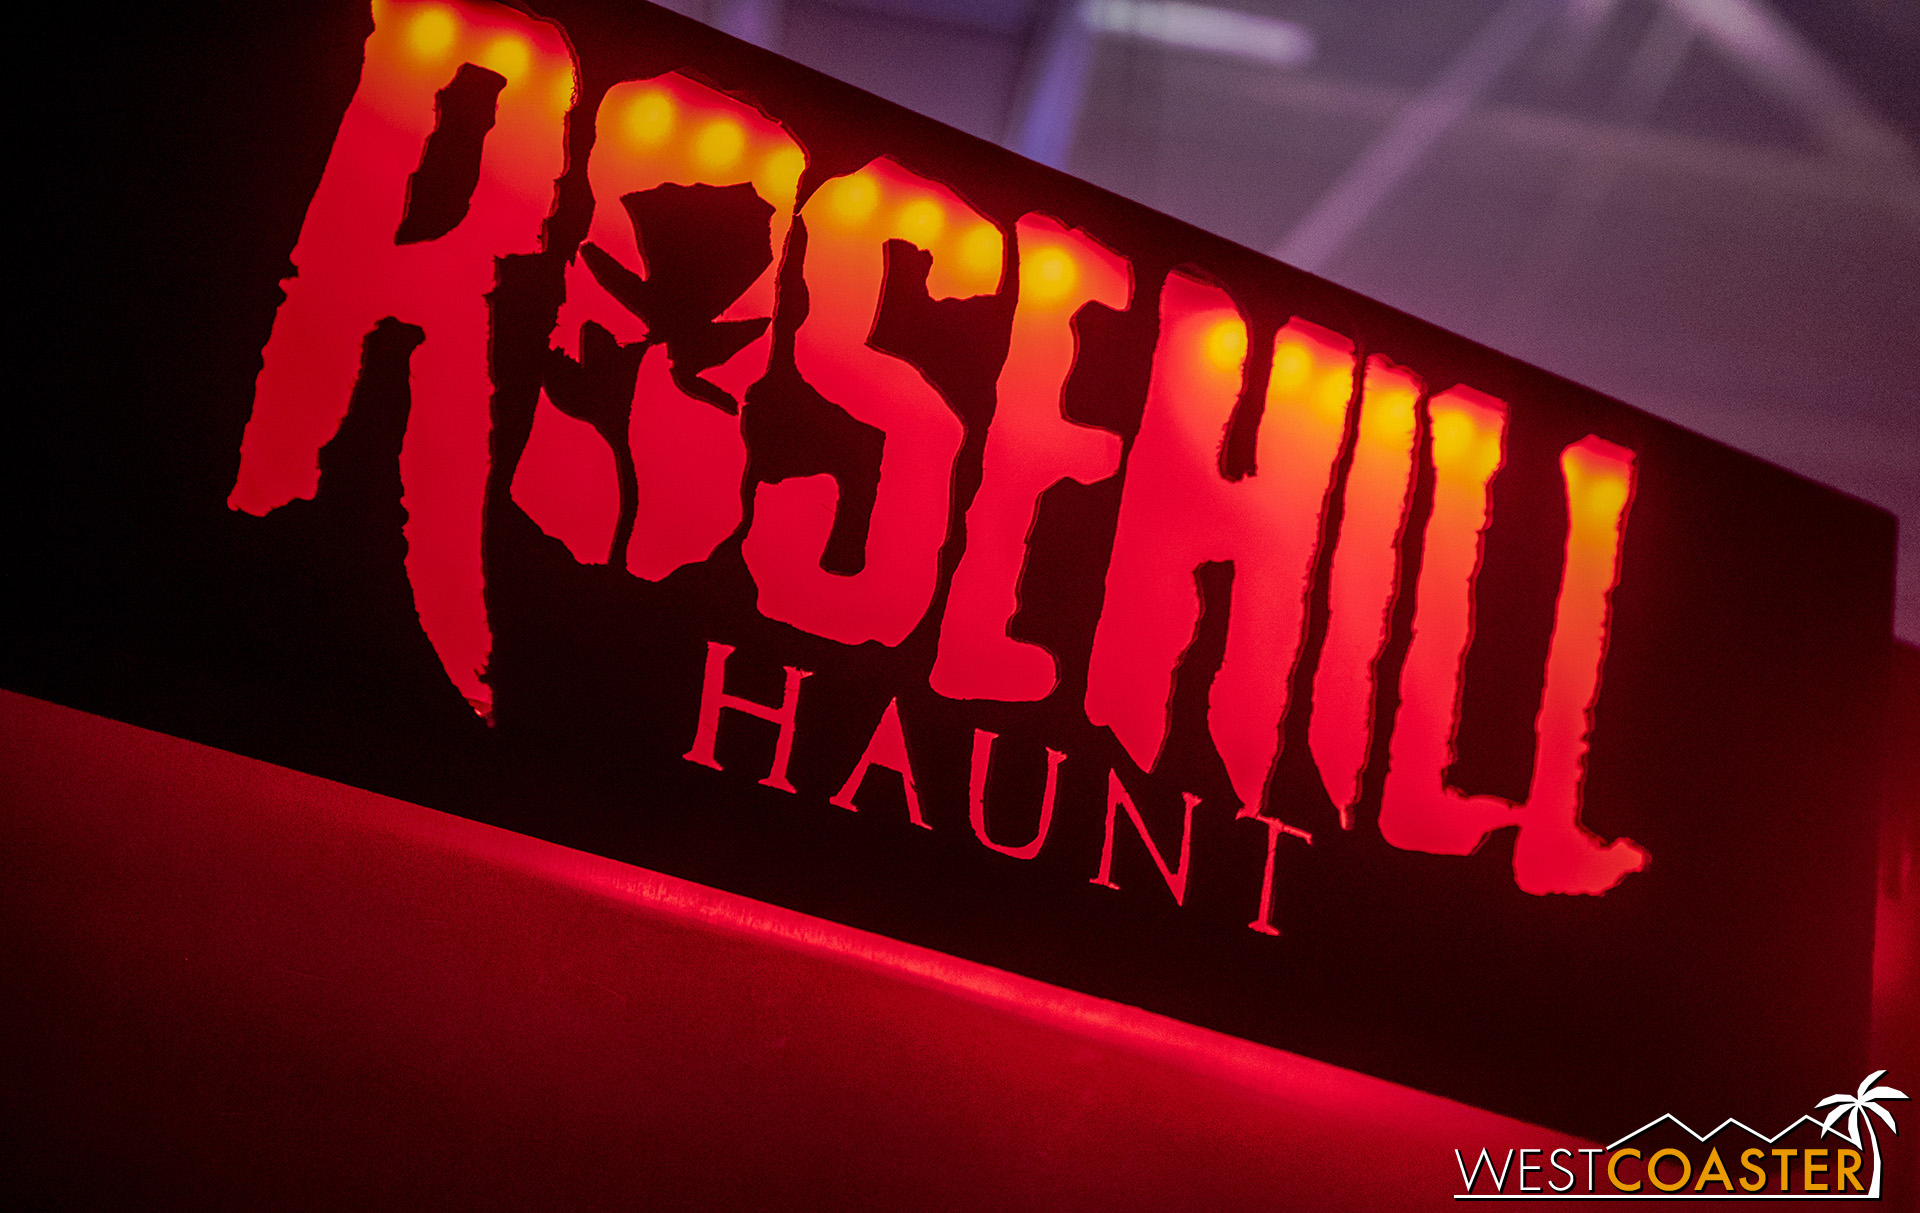 MSS-19_0809-02-RosehillHaunt-CemeteryCelebration-0001.jpg